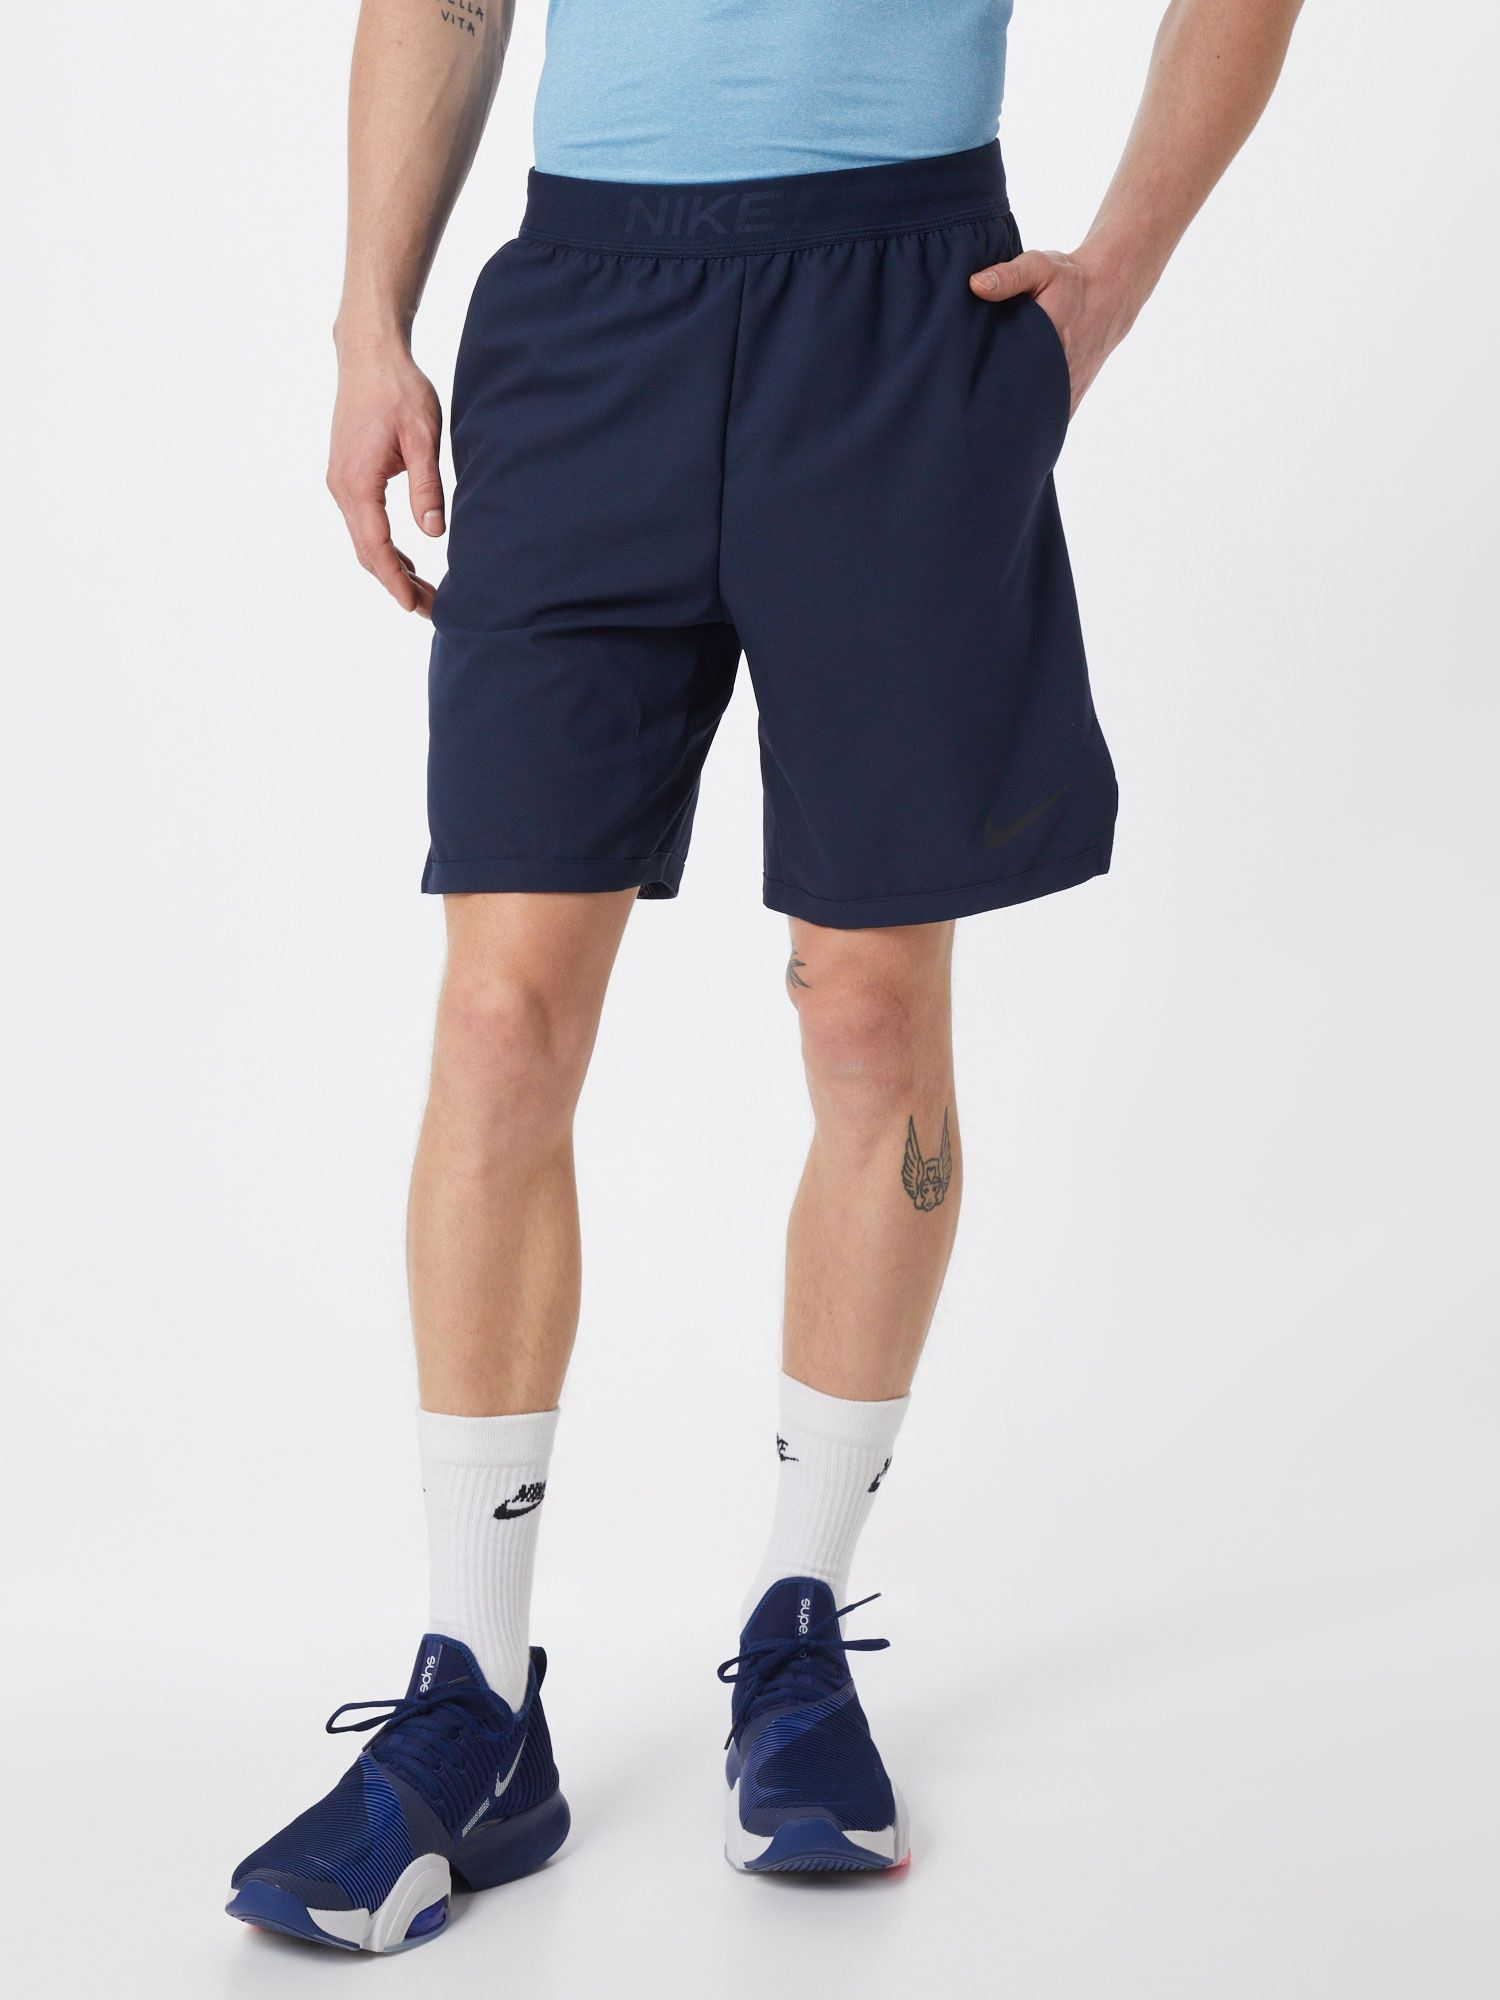 Nike Sporthose Flx Vent Max 3 0 Herren Dunkelblau Grosse Xl In 2020 Nike Sporthose Nike Fitness Und Fitness Hose